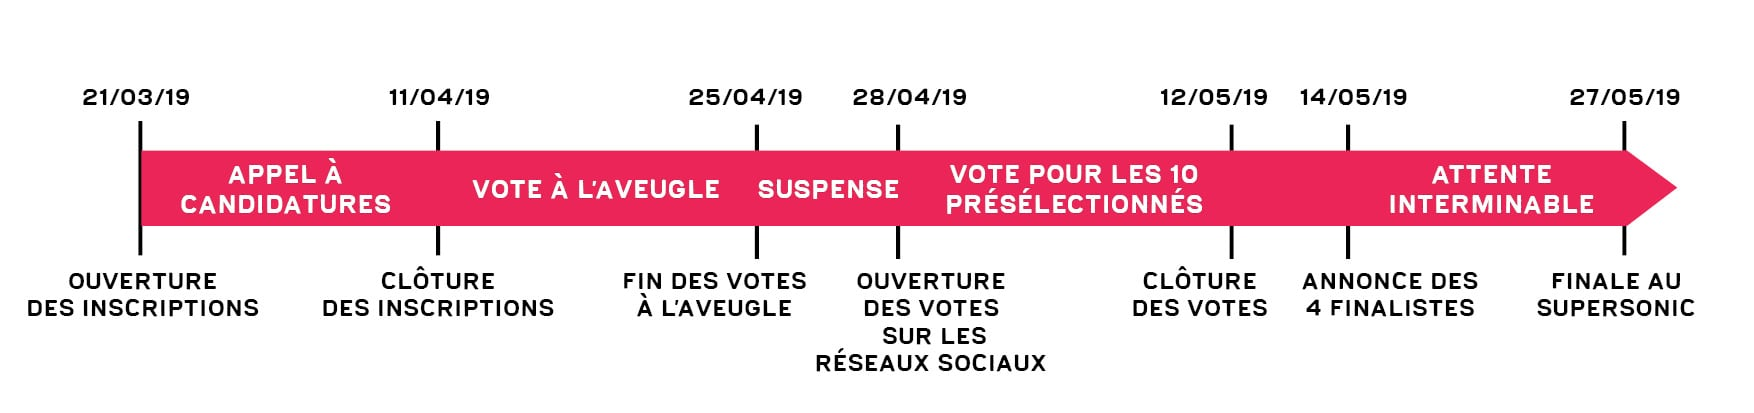 https://cdn2.szigetfestival.com/c8xtn2/f851/fr/media/2019/03/frise_tremplin_rouge_27_mai.jpg